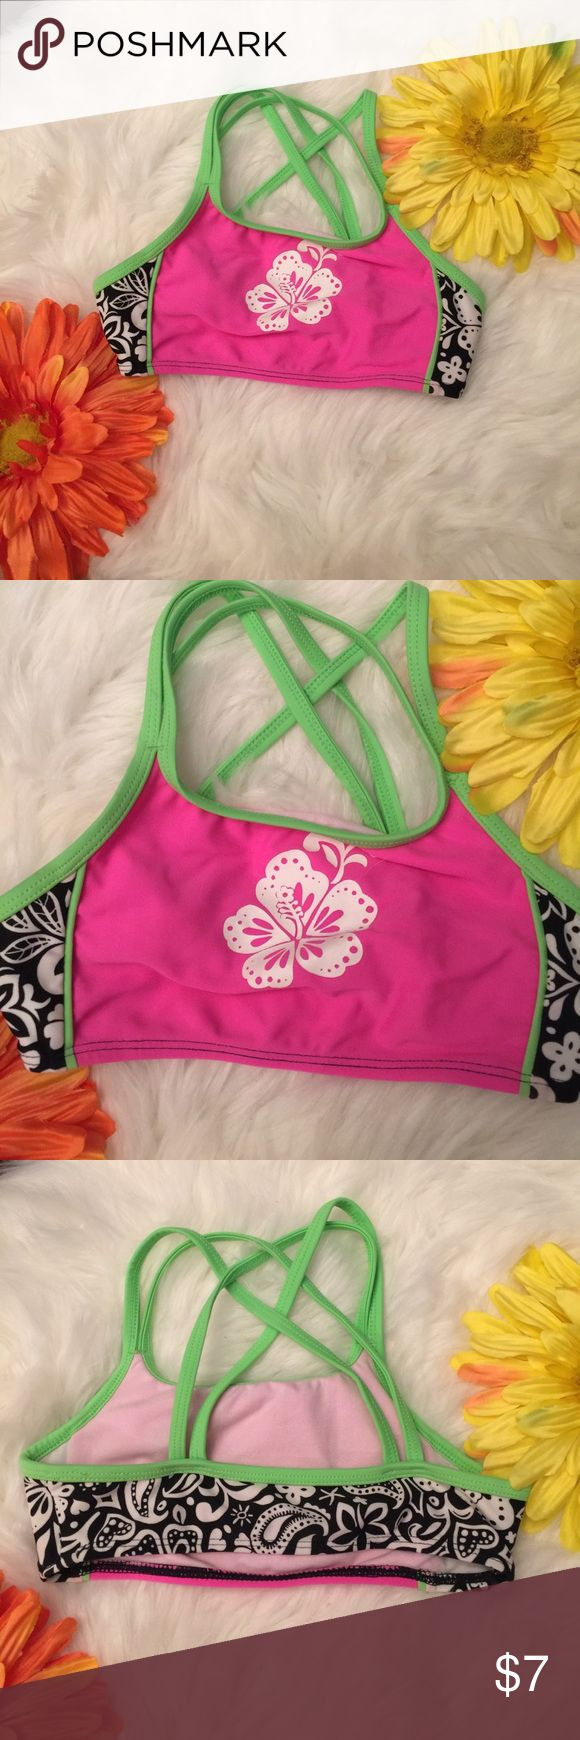 Girls bikini top Cute girls bikini top! Vibrant colors and so adorable! No stains, holes, or tears! EUC! Swim Bikinis